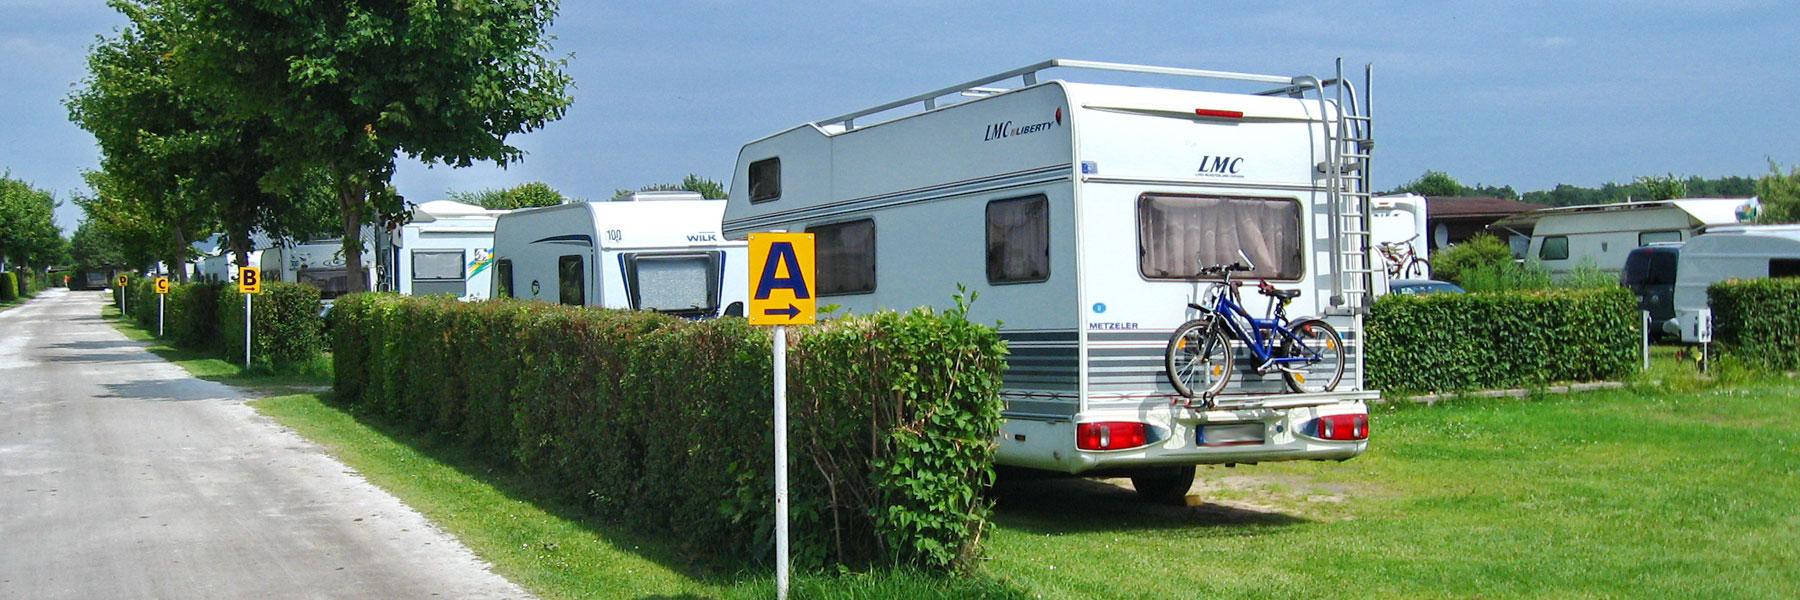 Wohnmobile - Campingplatz Leuchtturm